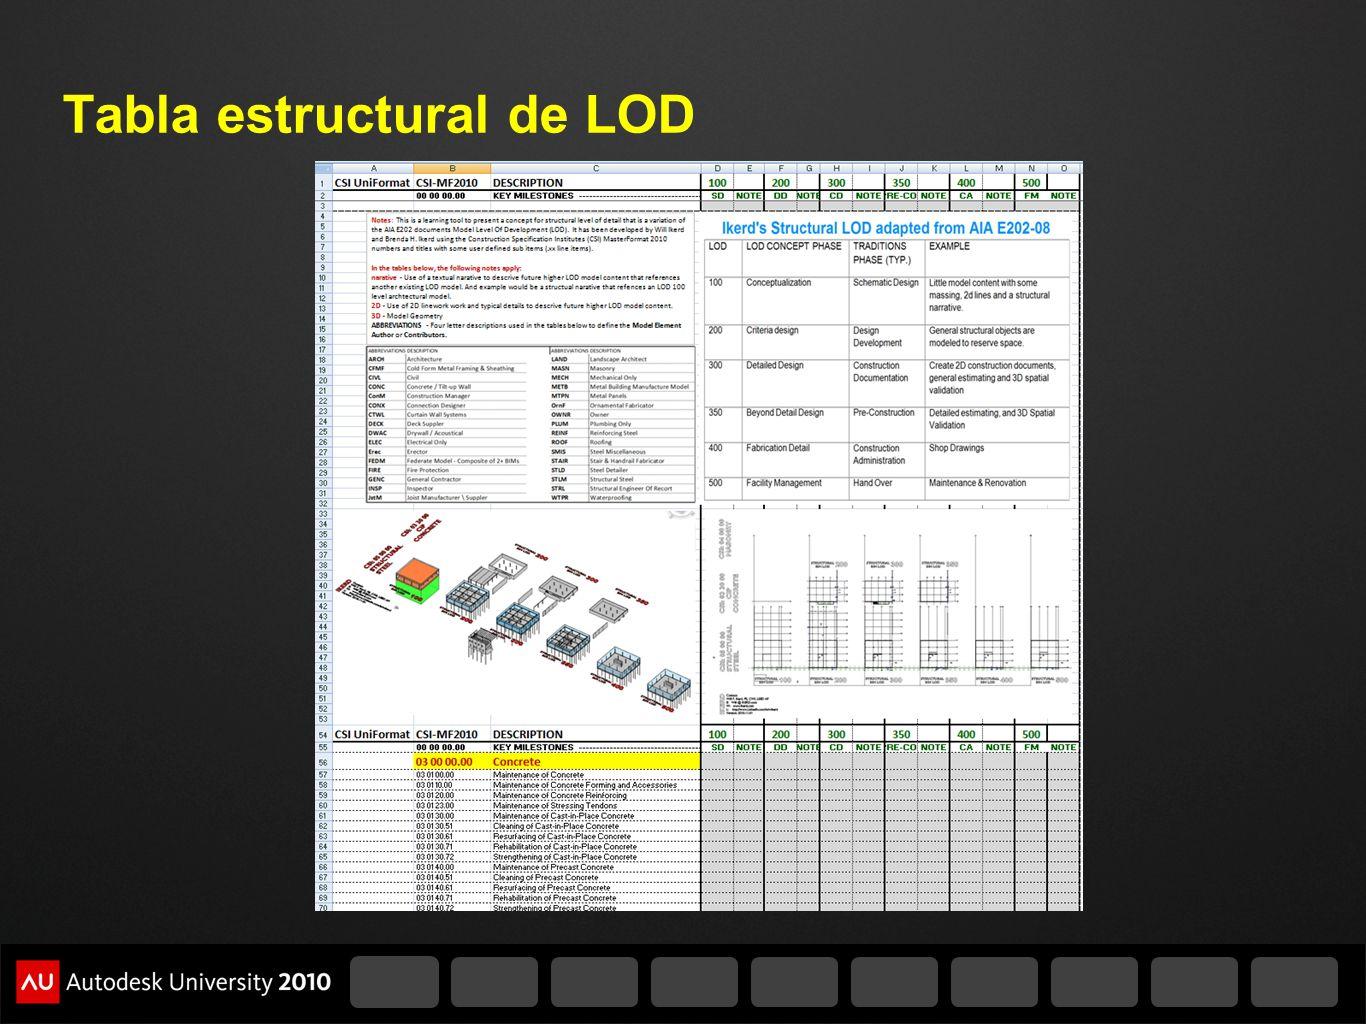 Tabla estructural de LOD